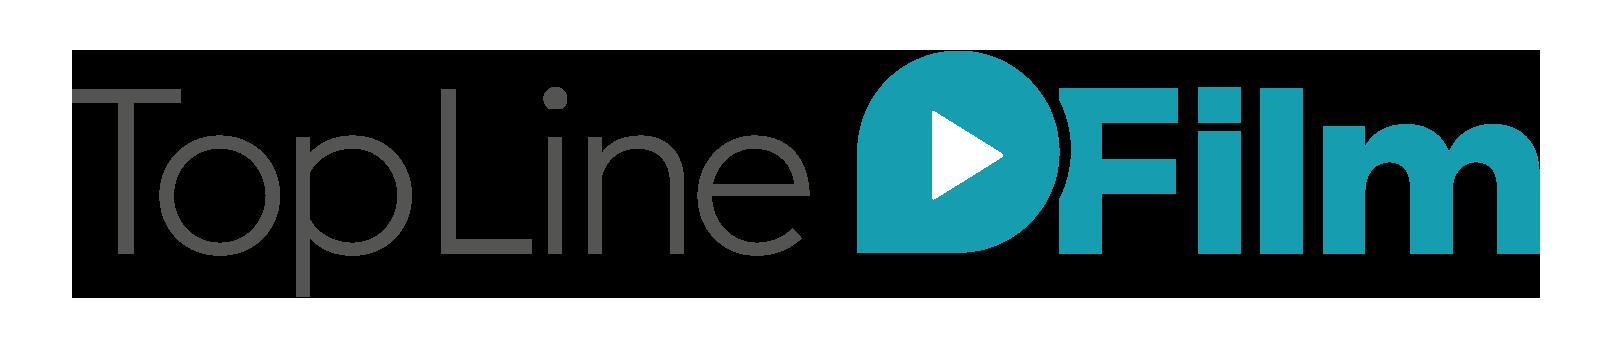 TopLine Film